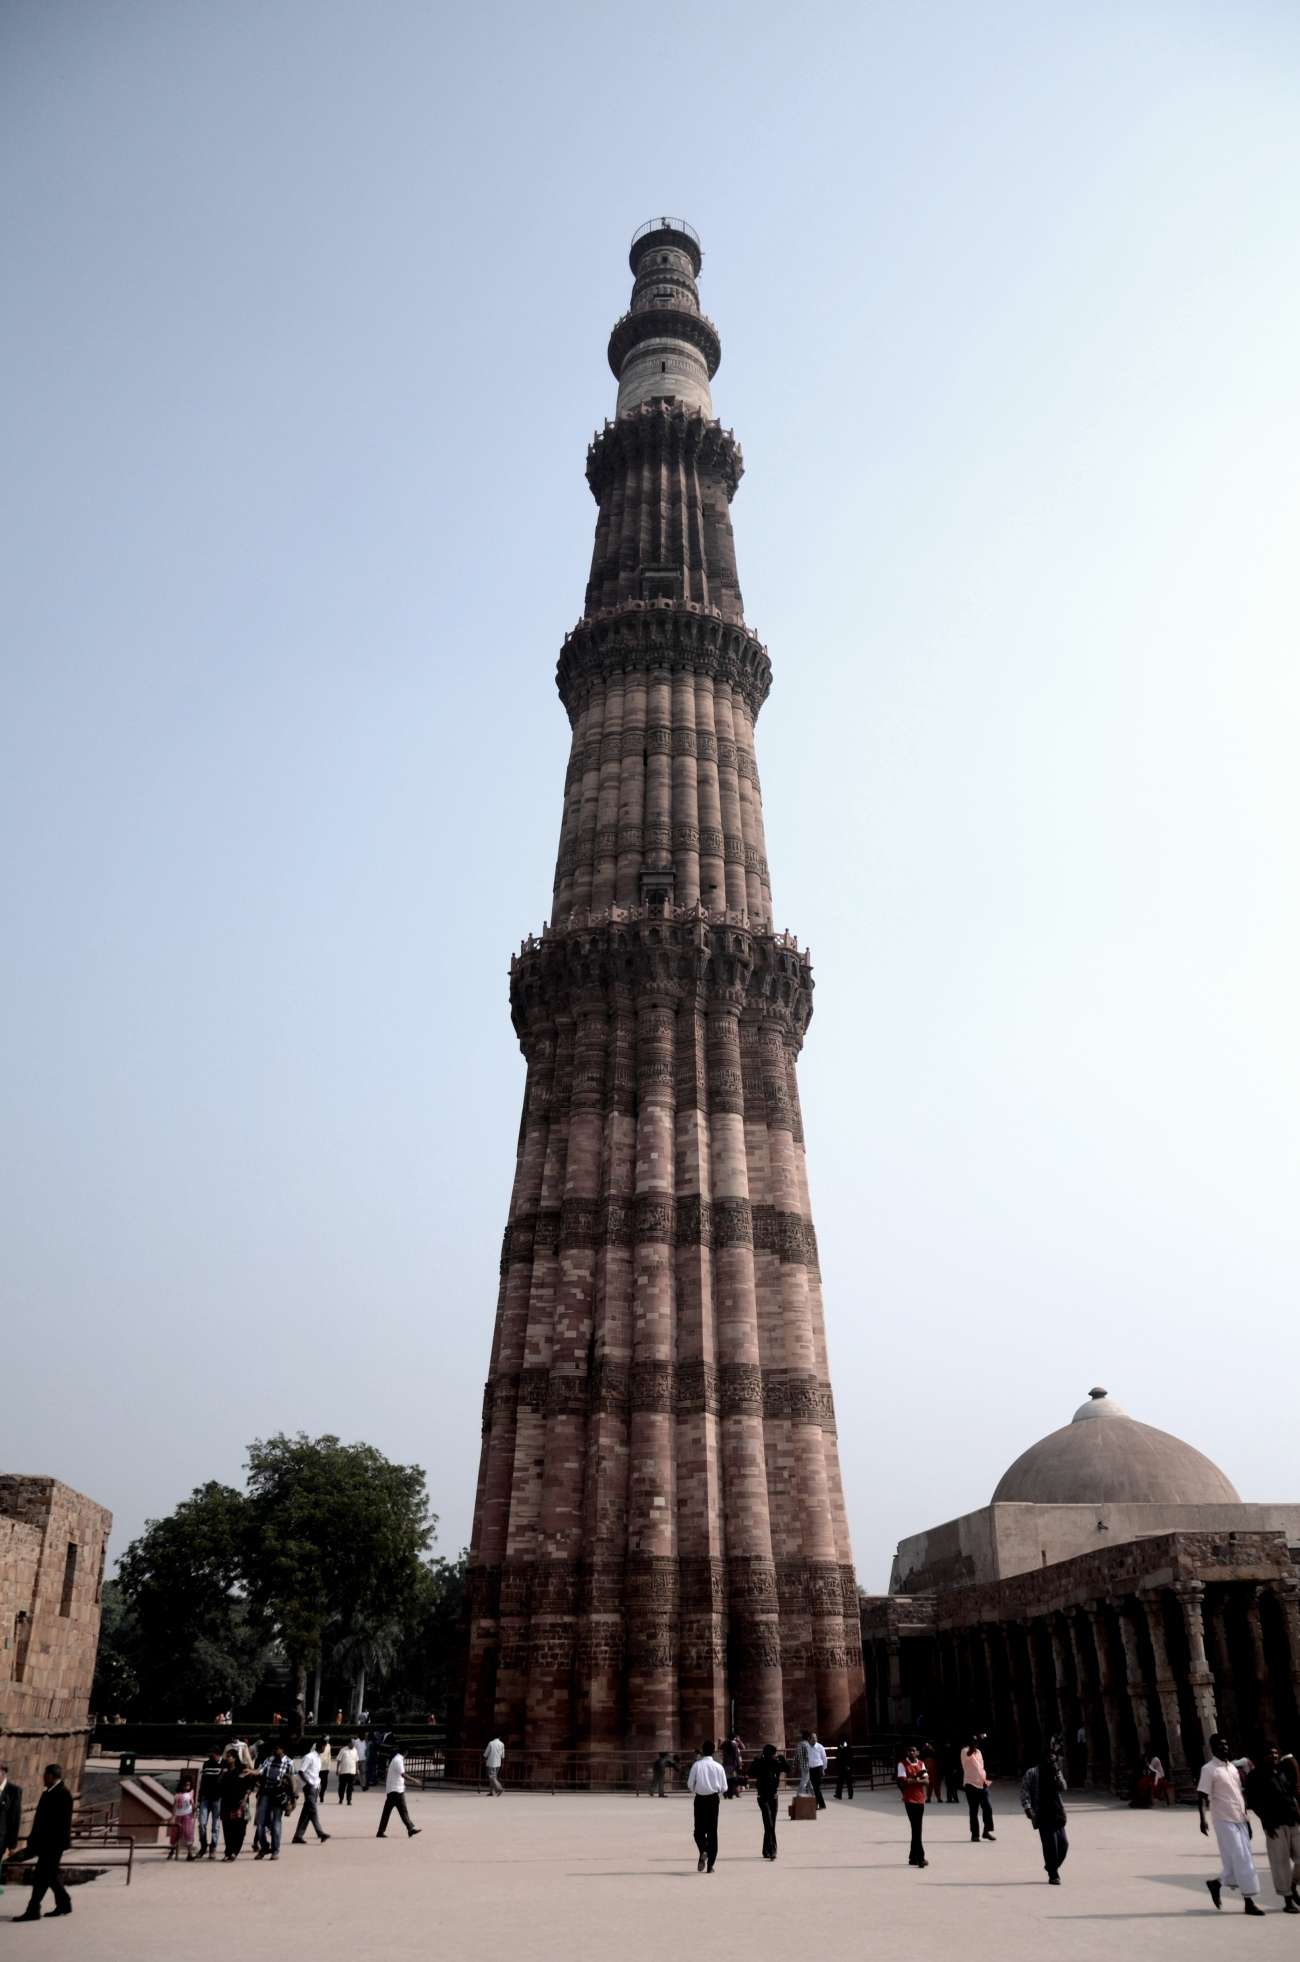 The qutub minar full view